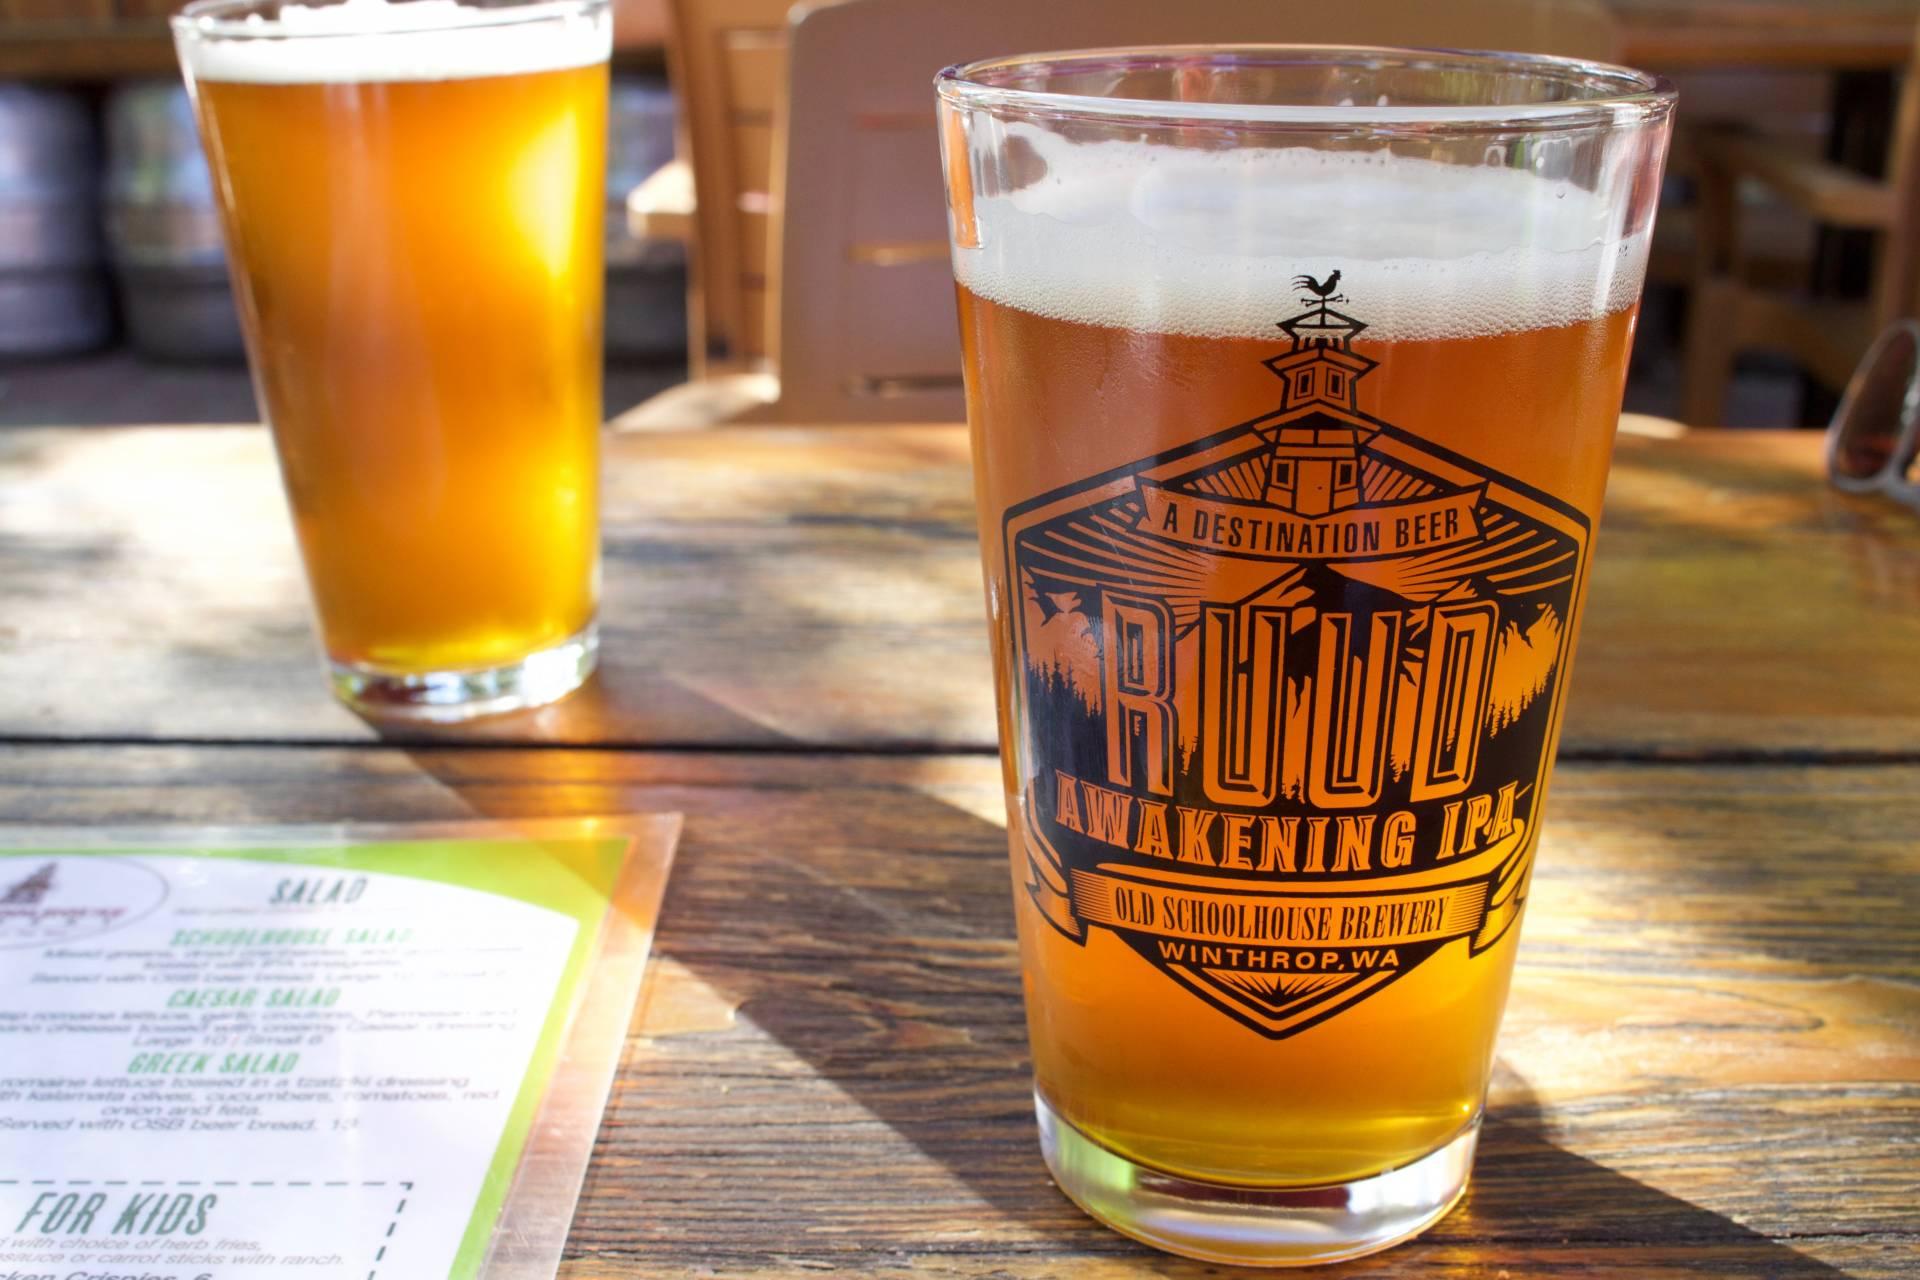 RUUD Awakening IPA at Old Schoolhouse Brewery in Winthrop WA